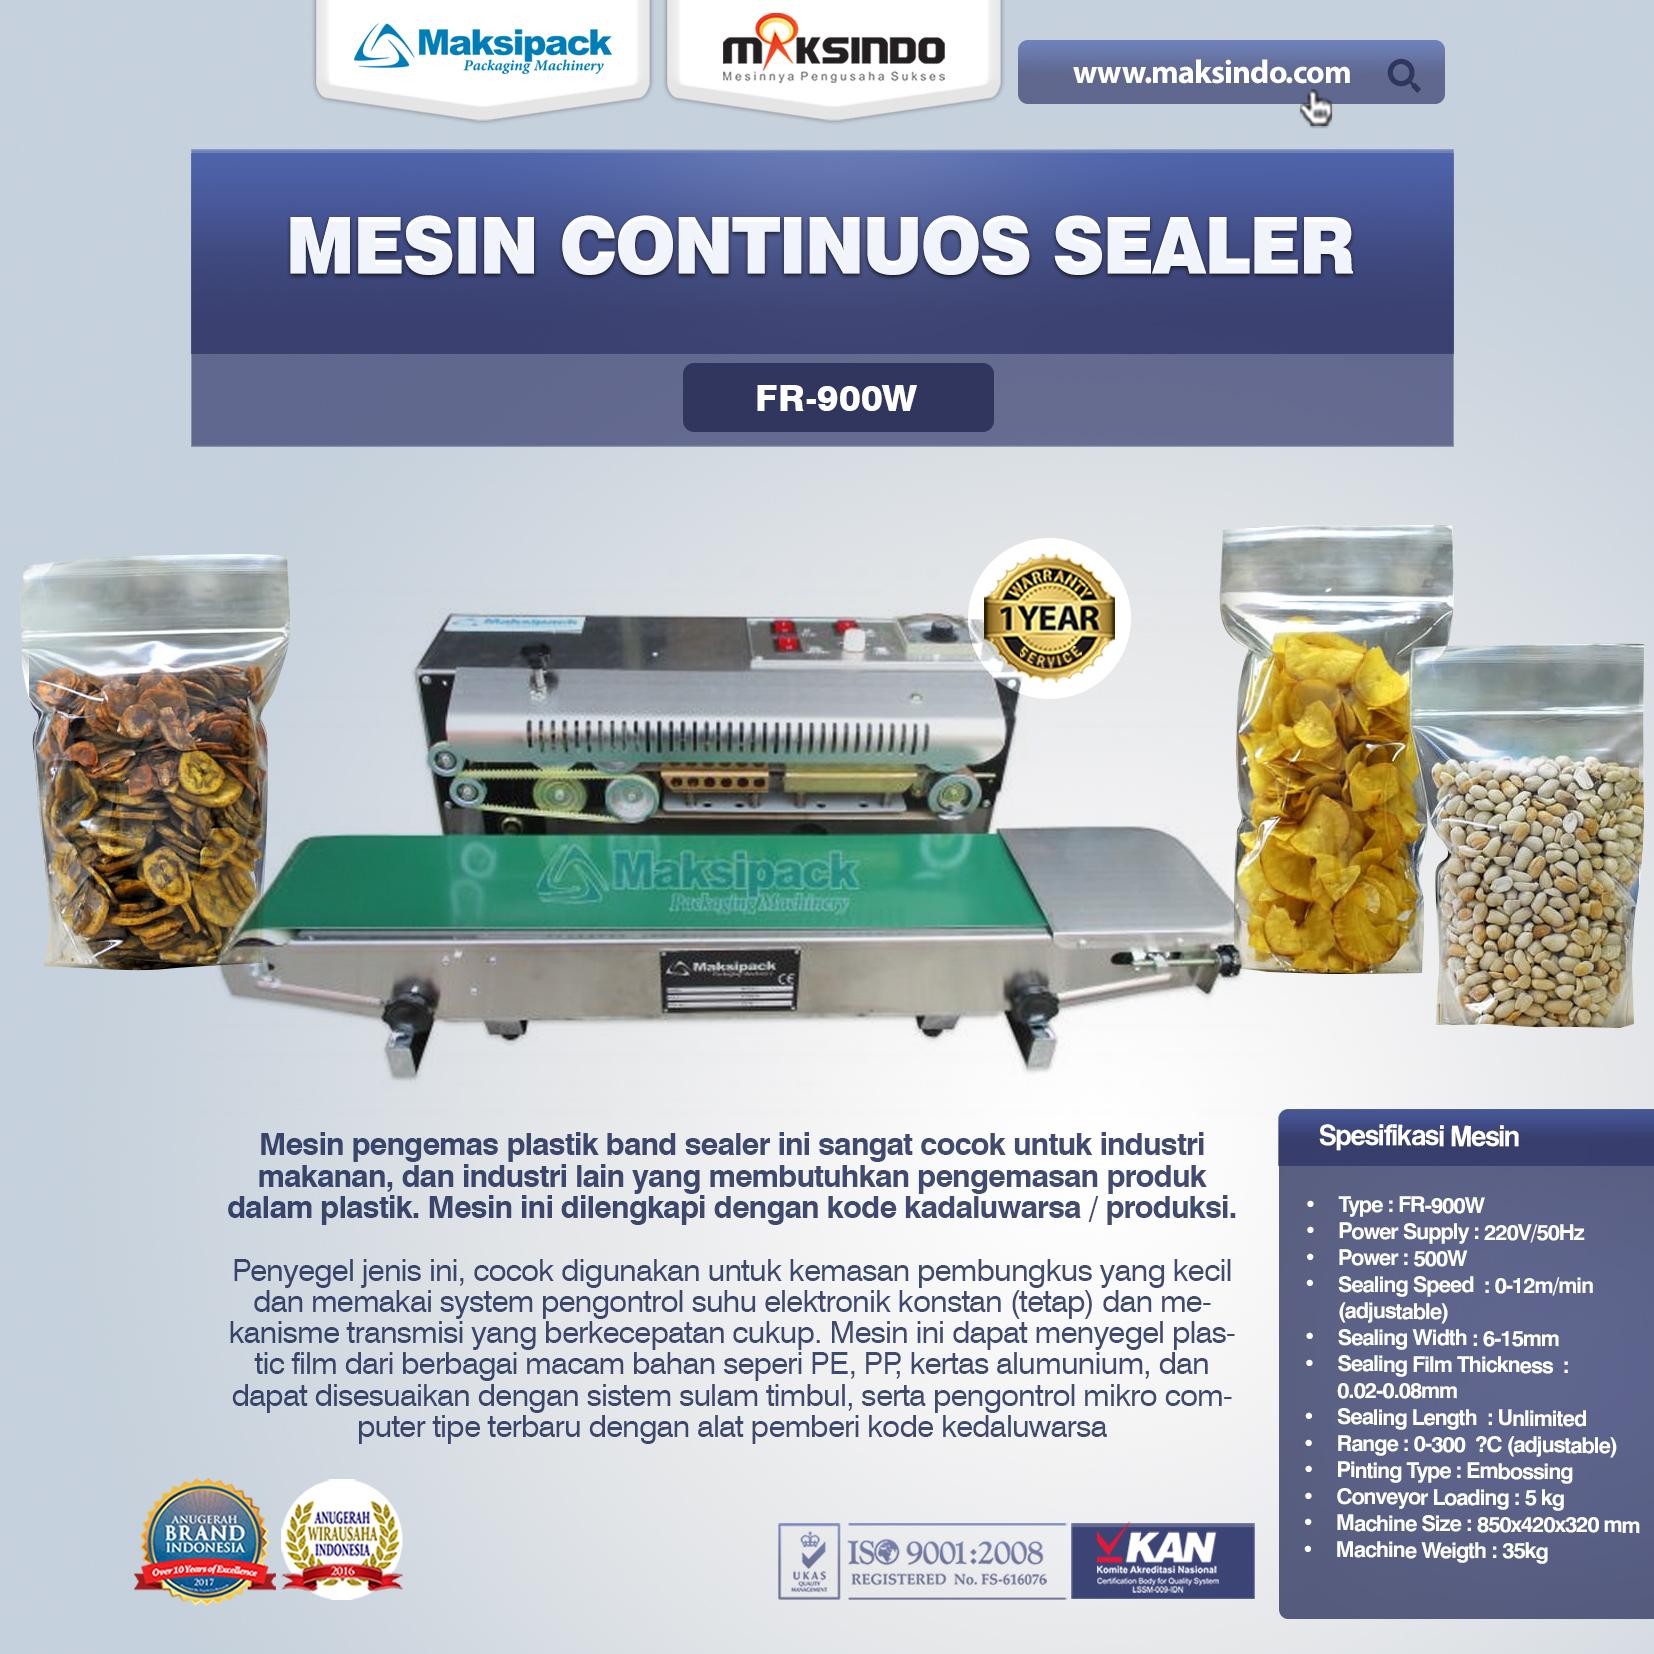 Mesin Continuos Sealer FR-900W